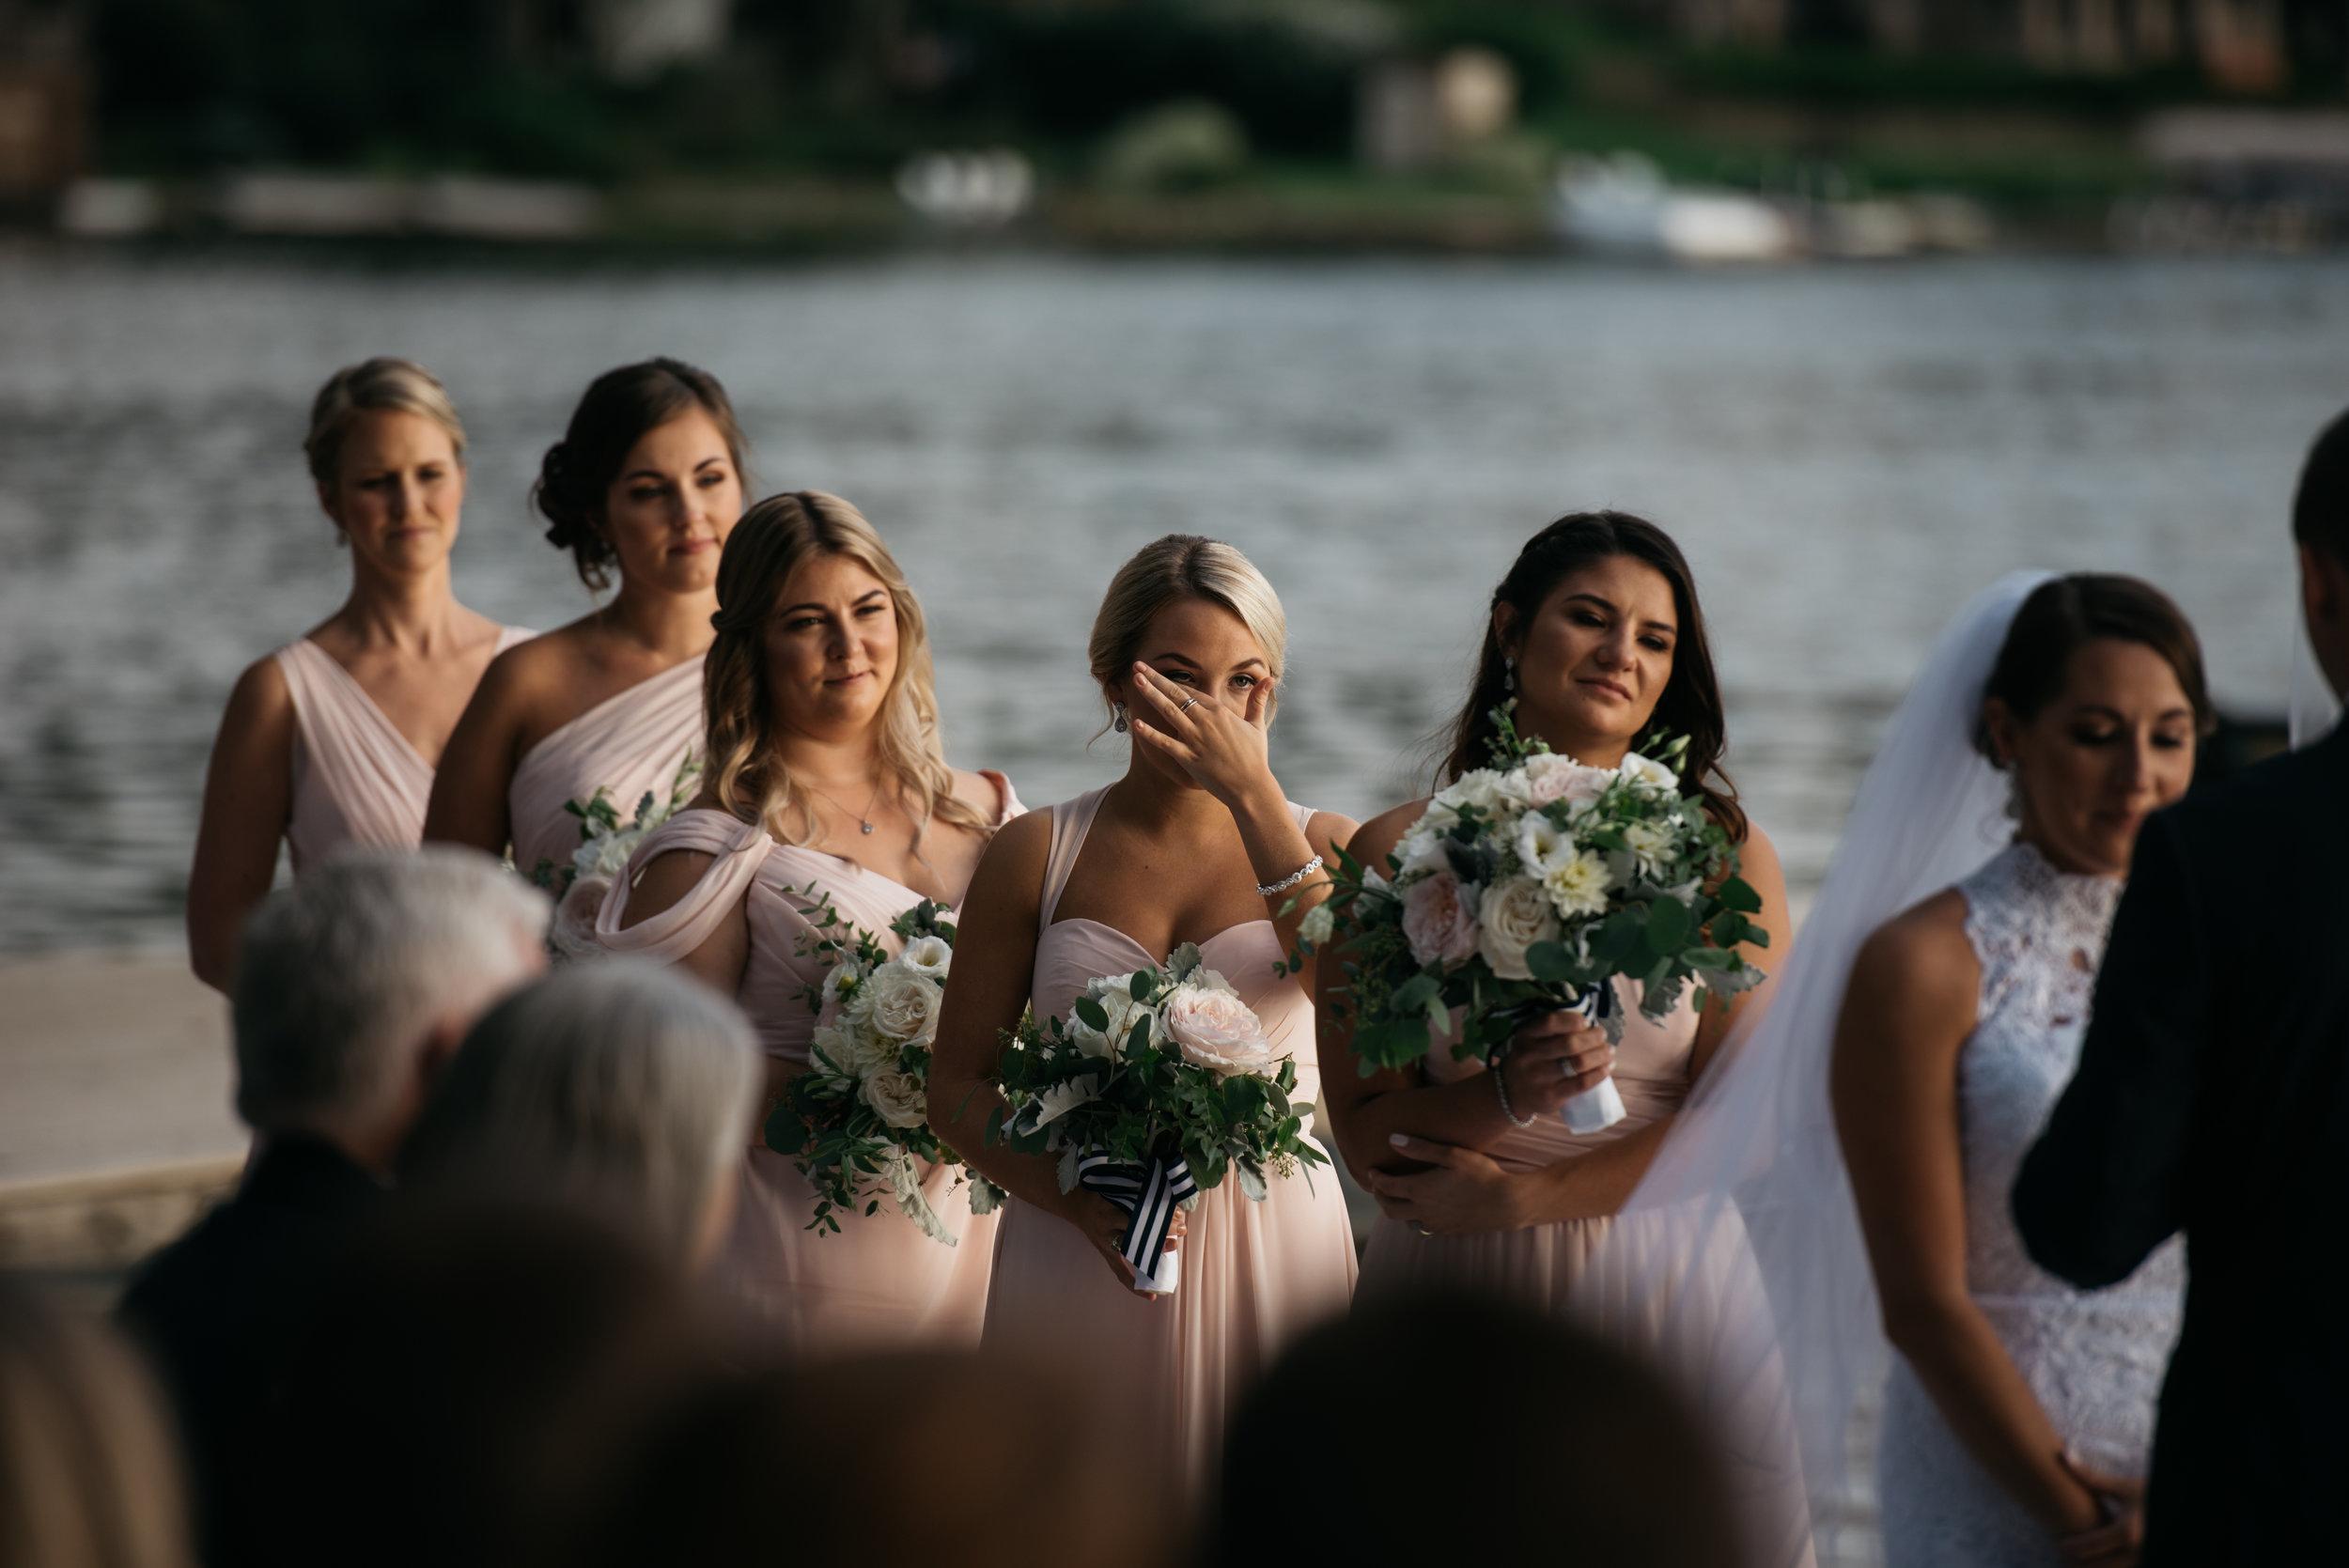 WeddingPhotos | NJPhotographer | Highlights-8-21.jpg